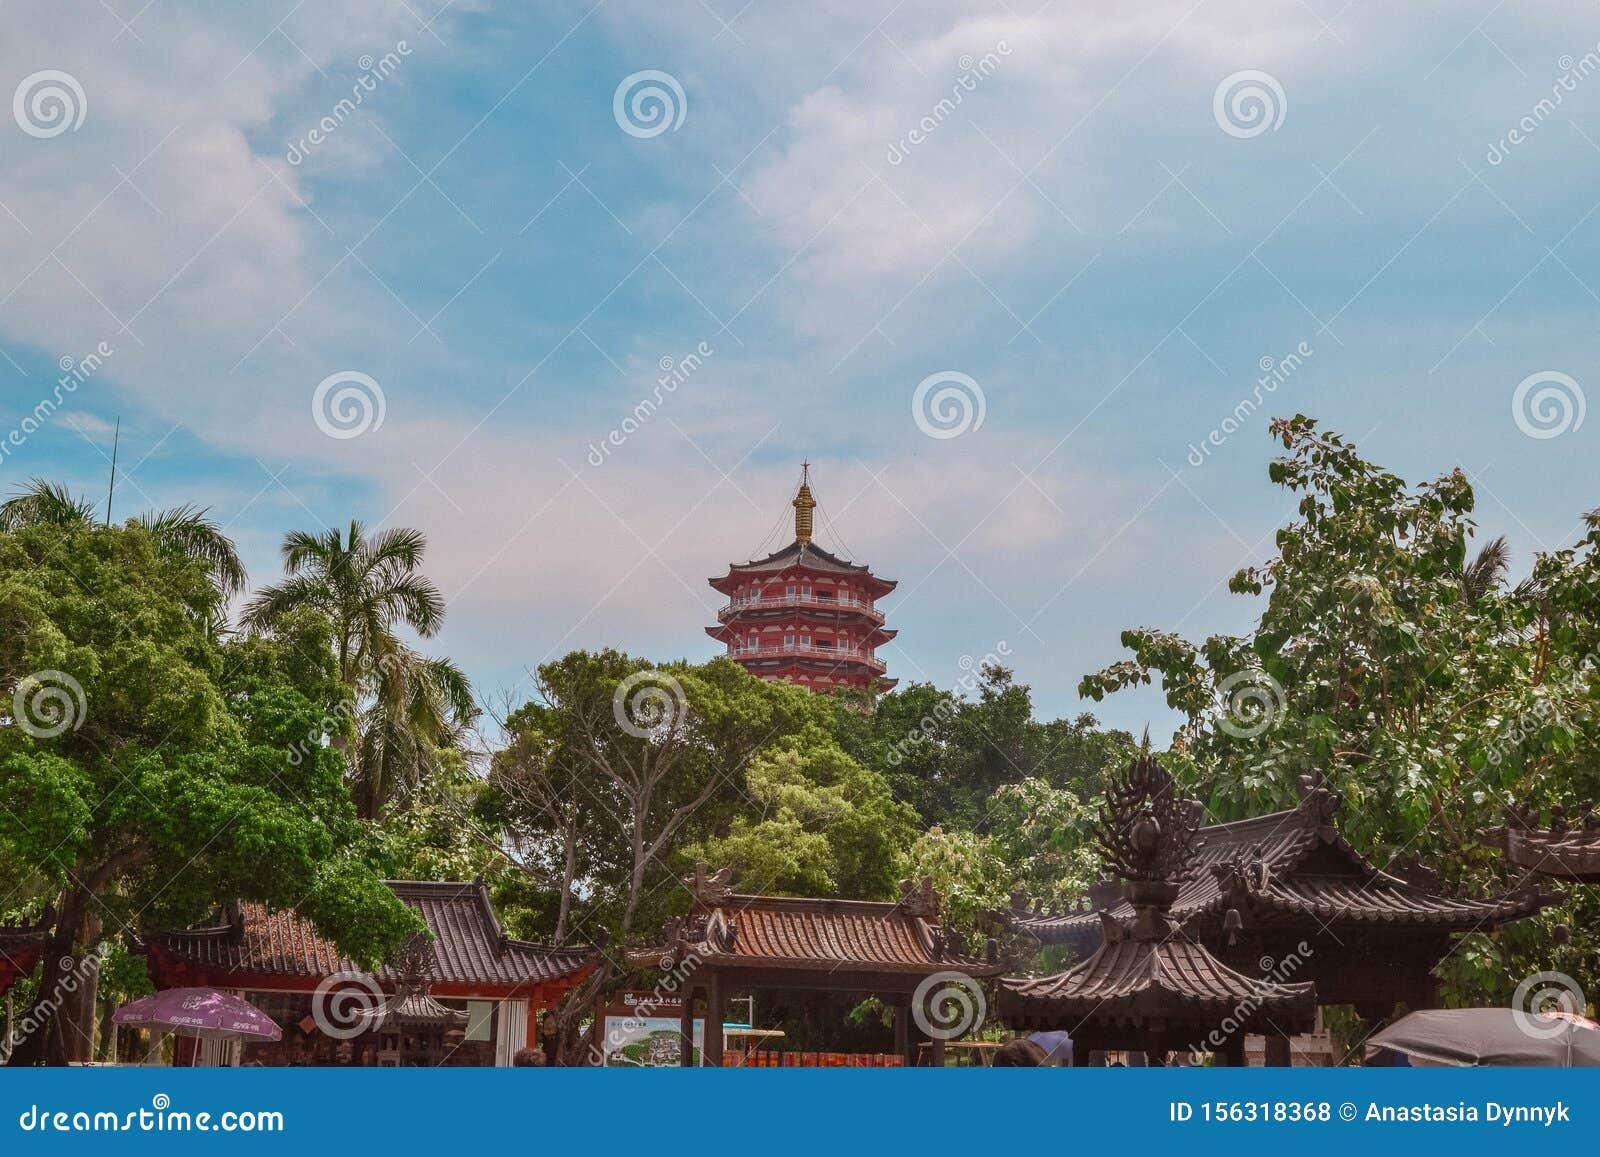 China ethnic buildings in Sanya Hainan